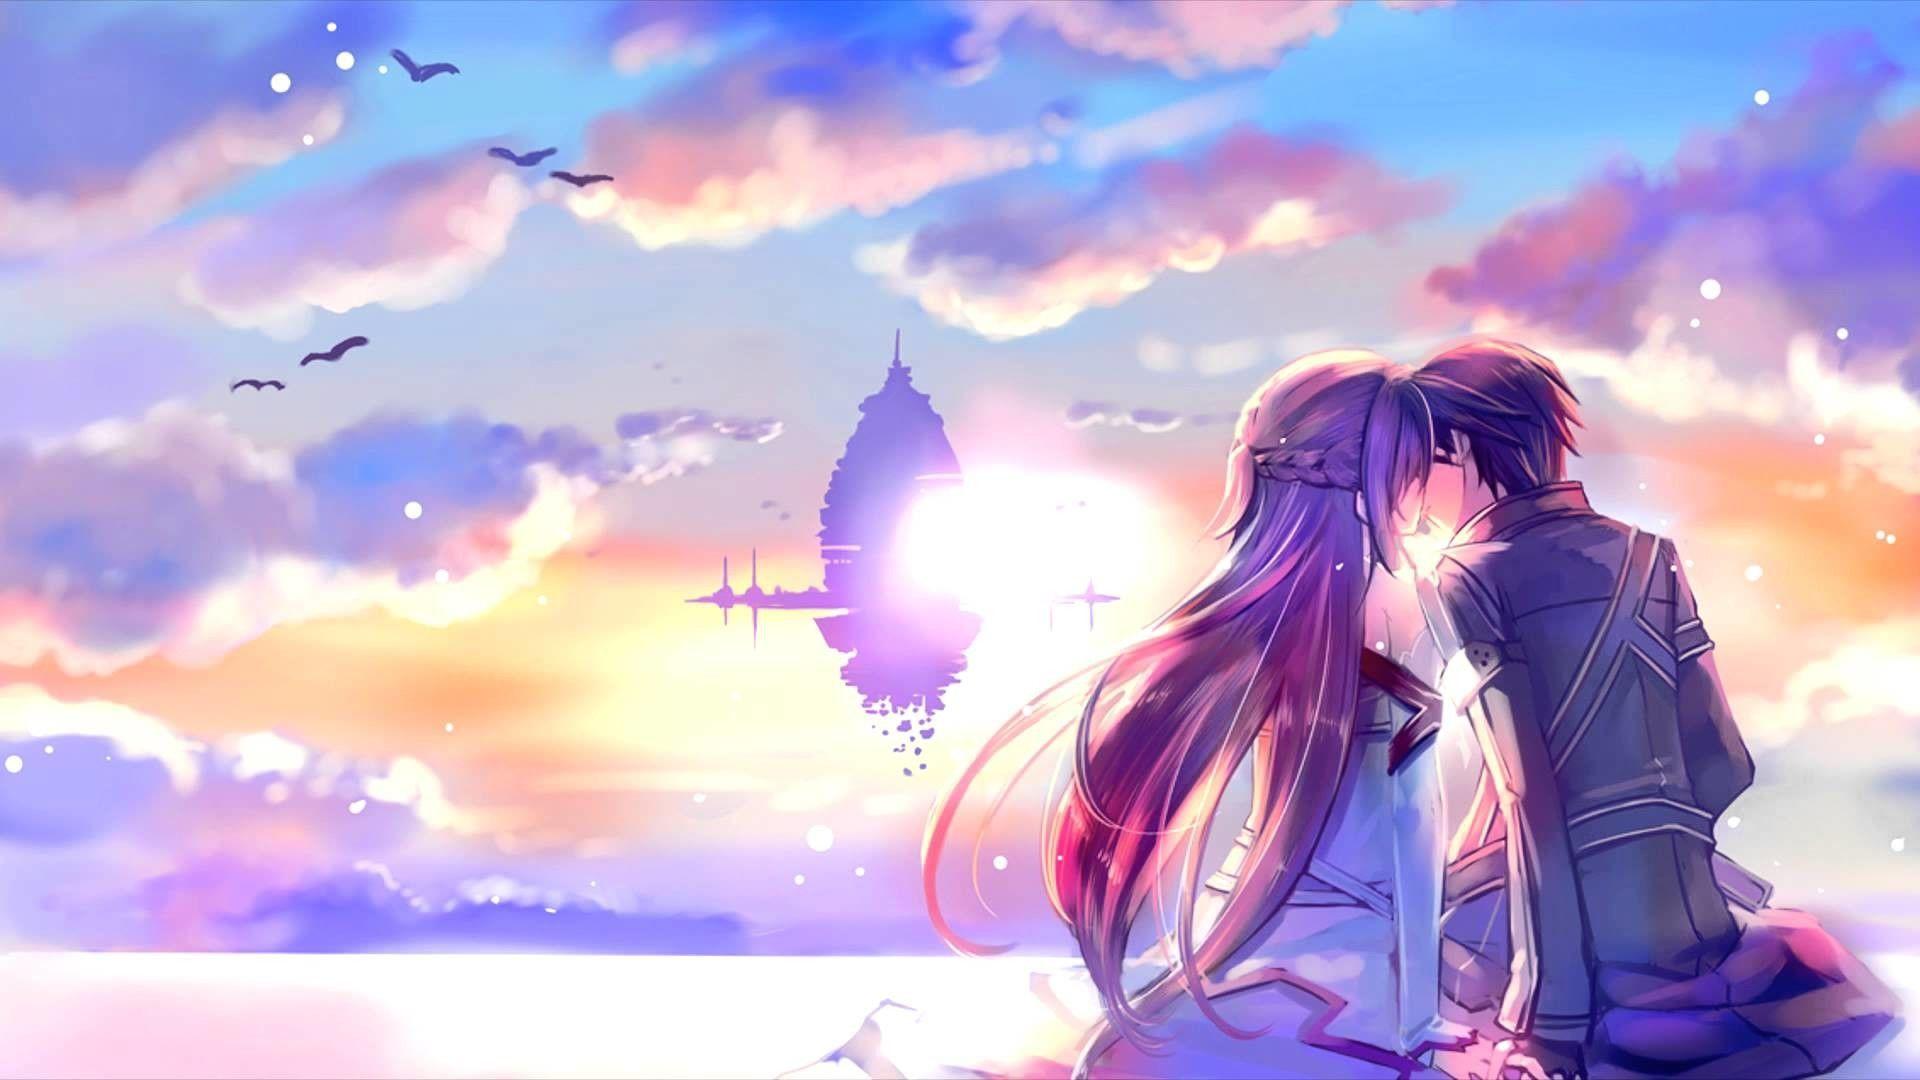 Anime Wallpaper Romantic Wallpaper Nice in 2020 Sword